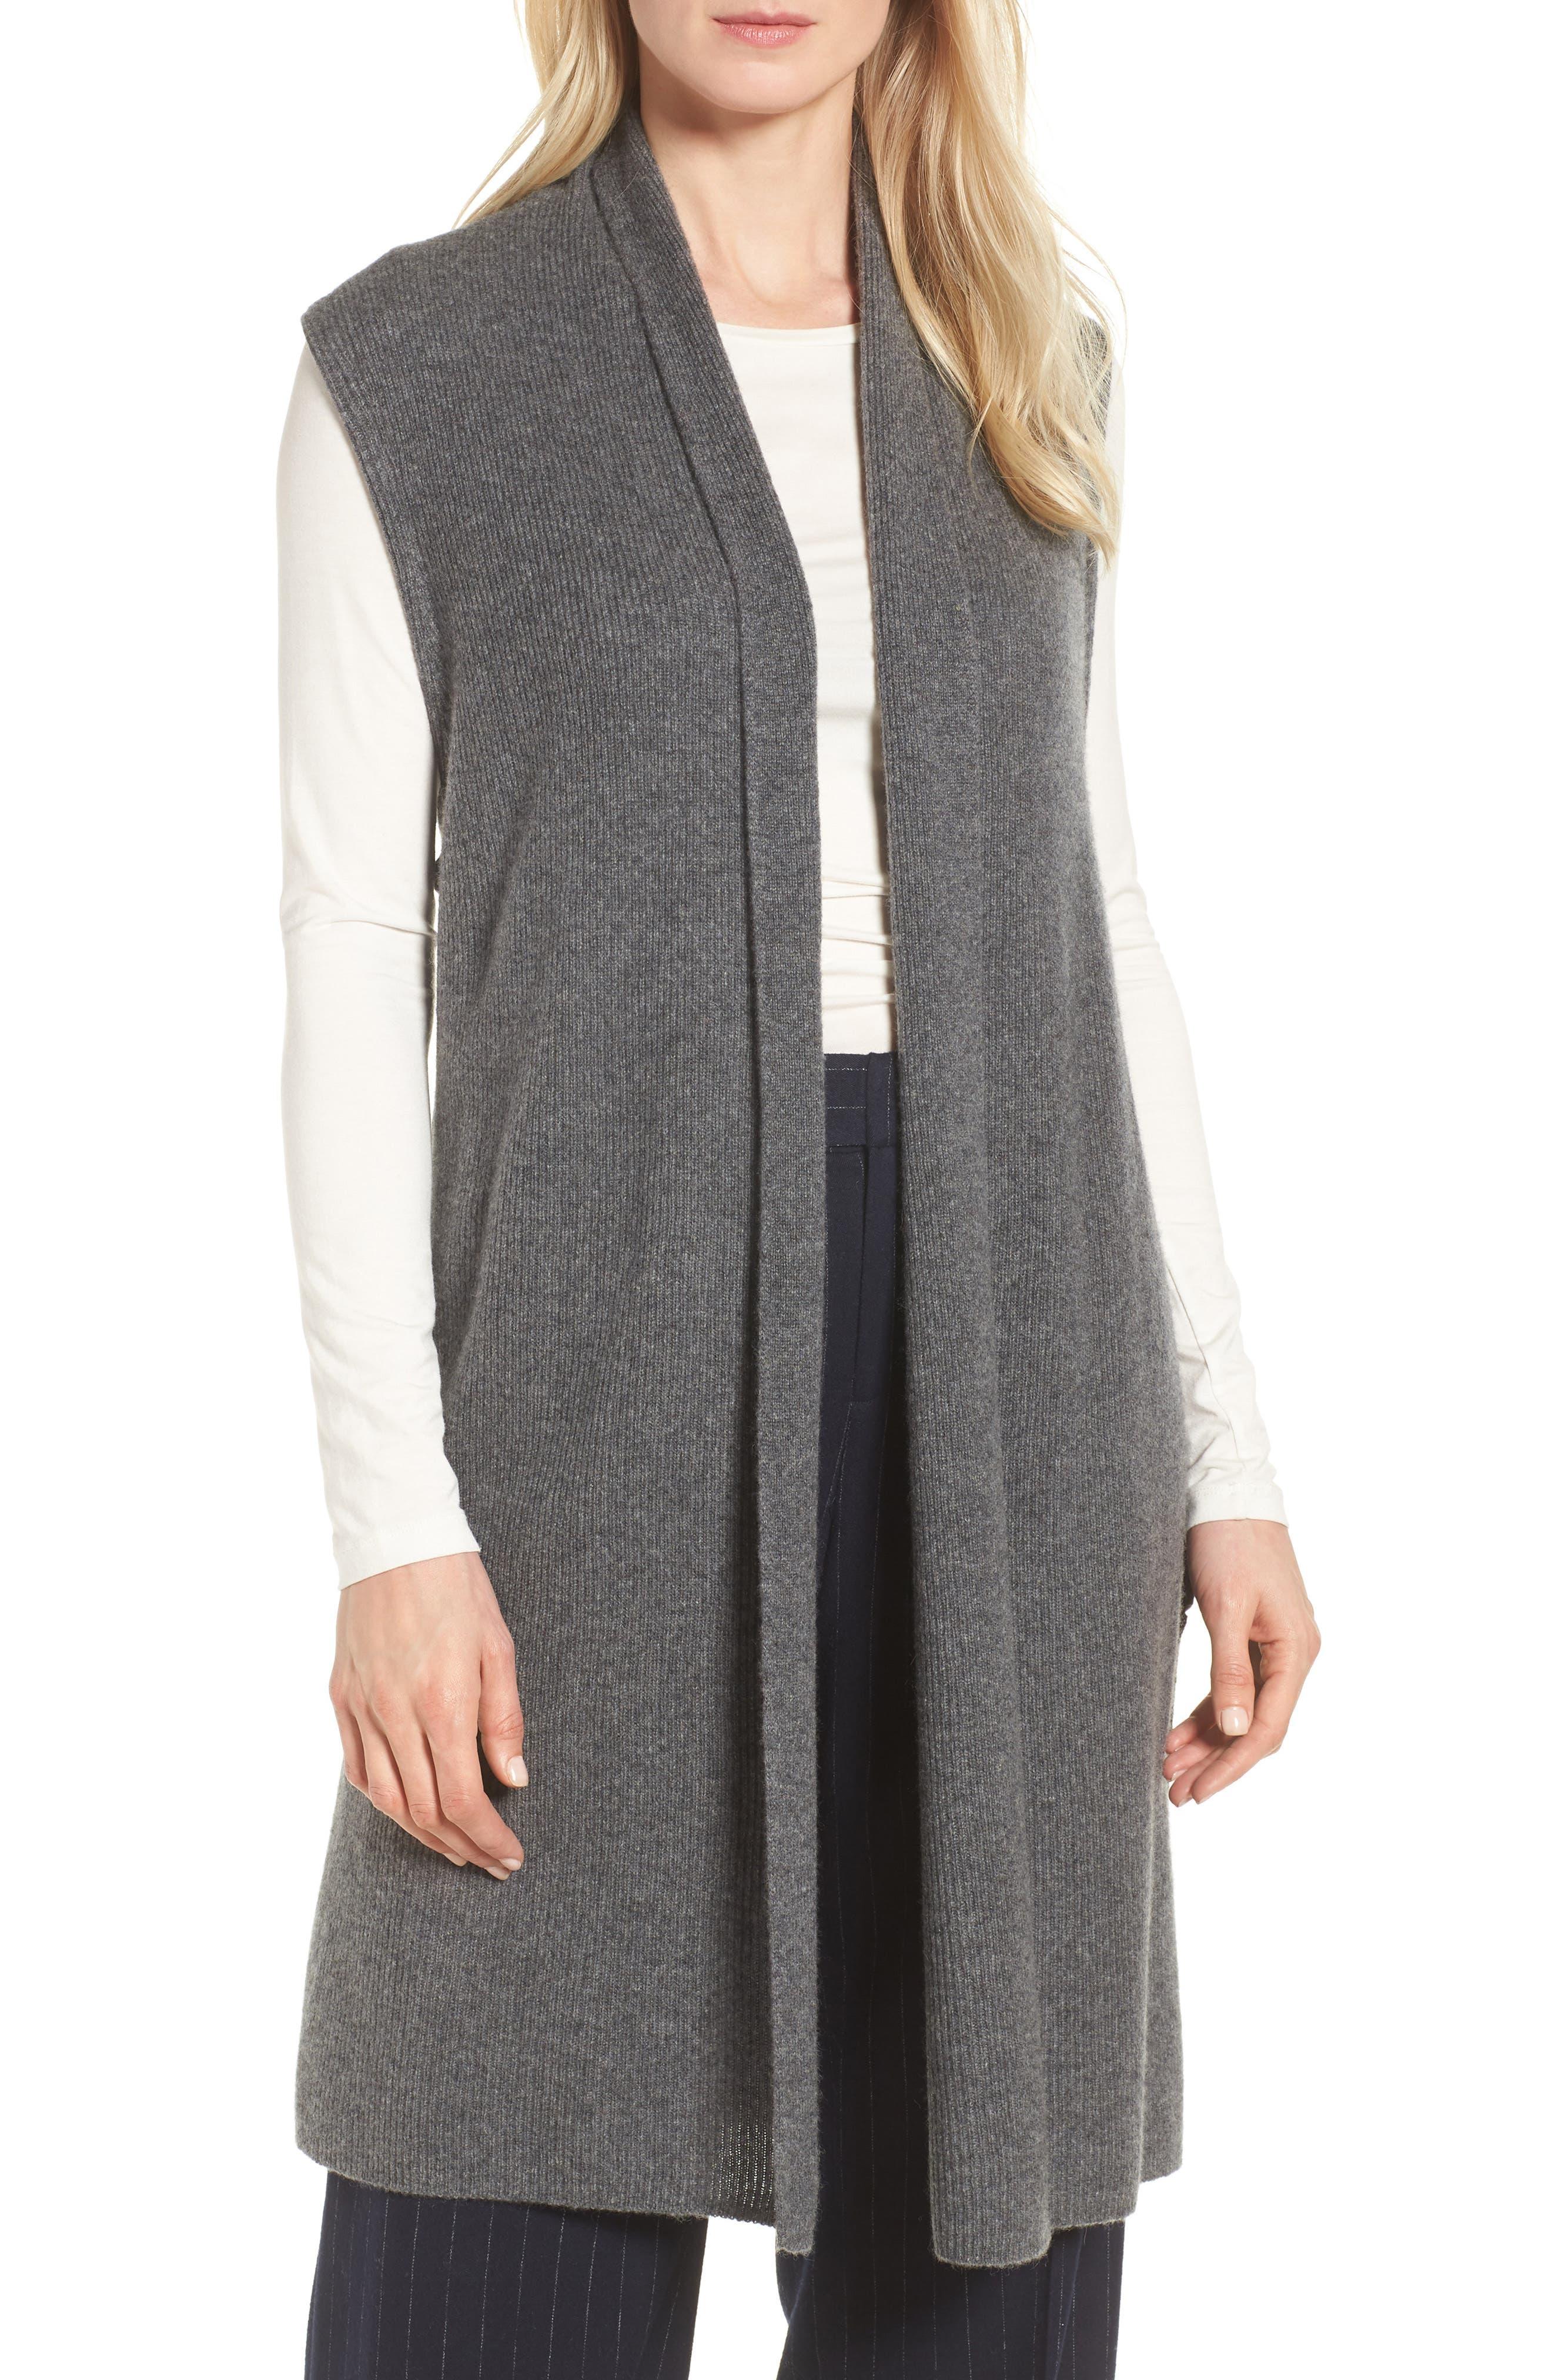 Ribbed Cashmere Vest,                         Main,                         color, Grey Dark Heather